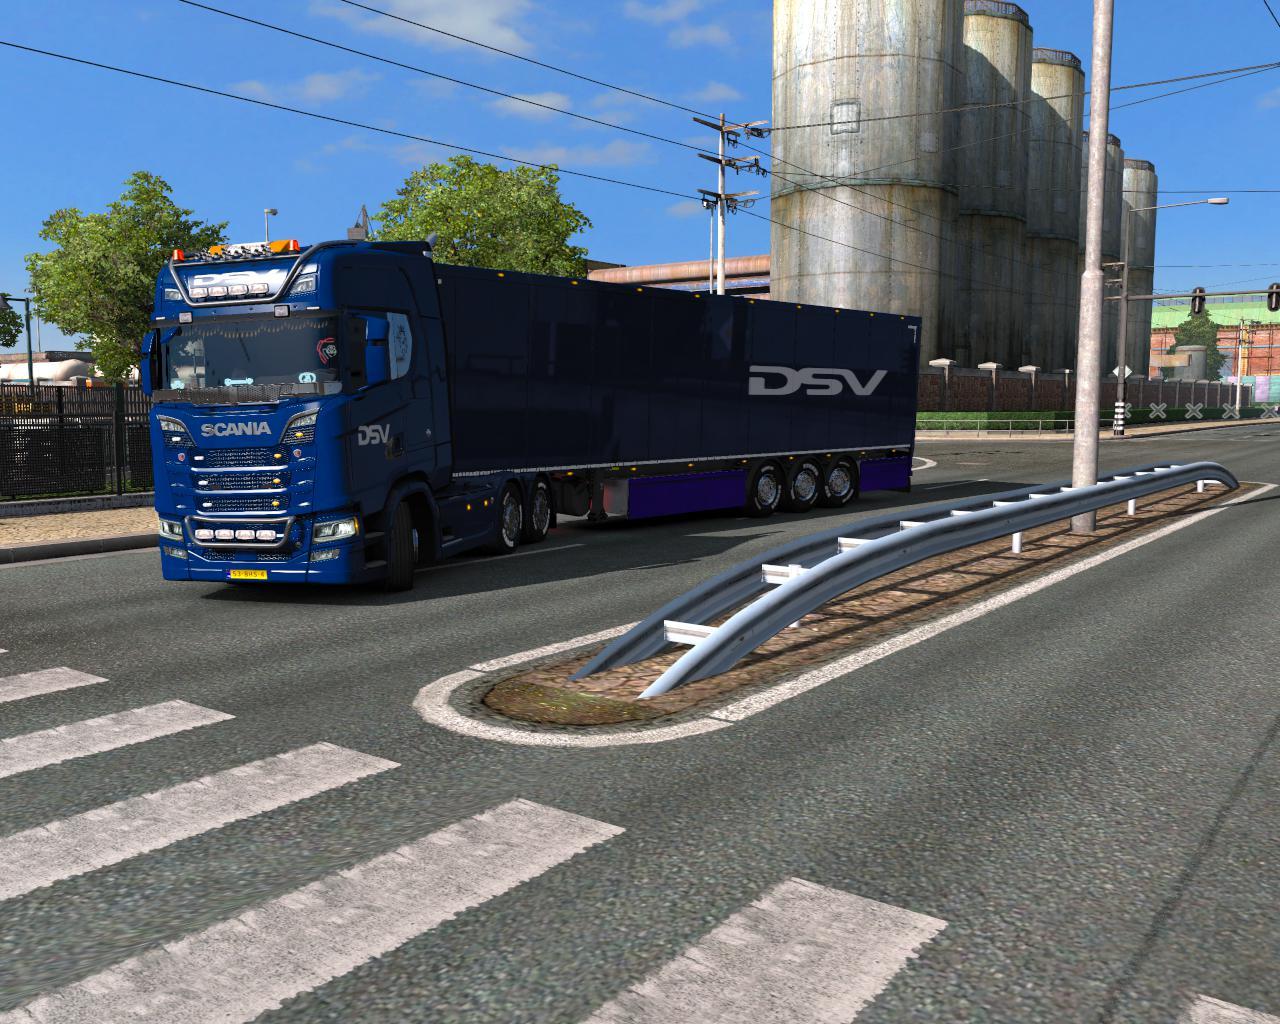 ETS2 - Scania R - S Nexte Gen Dsv Combo Skin V1.0 (1.37.x)